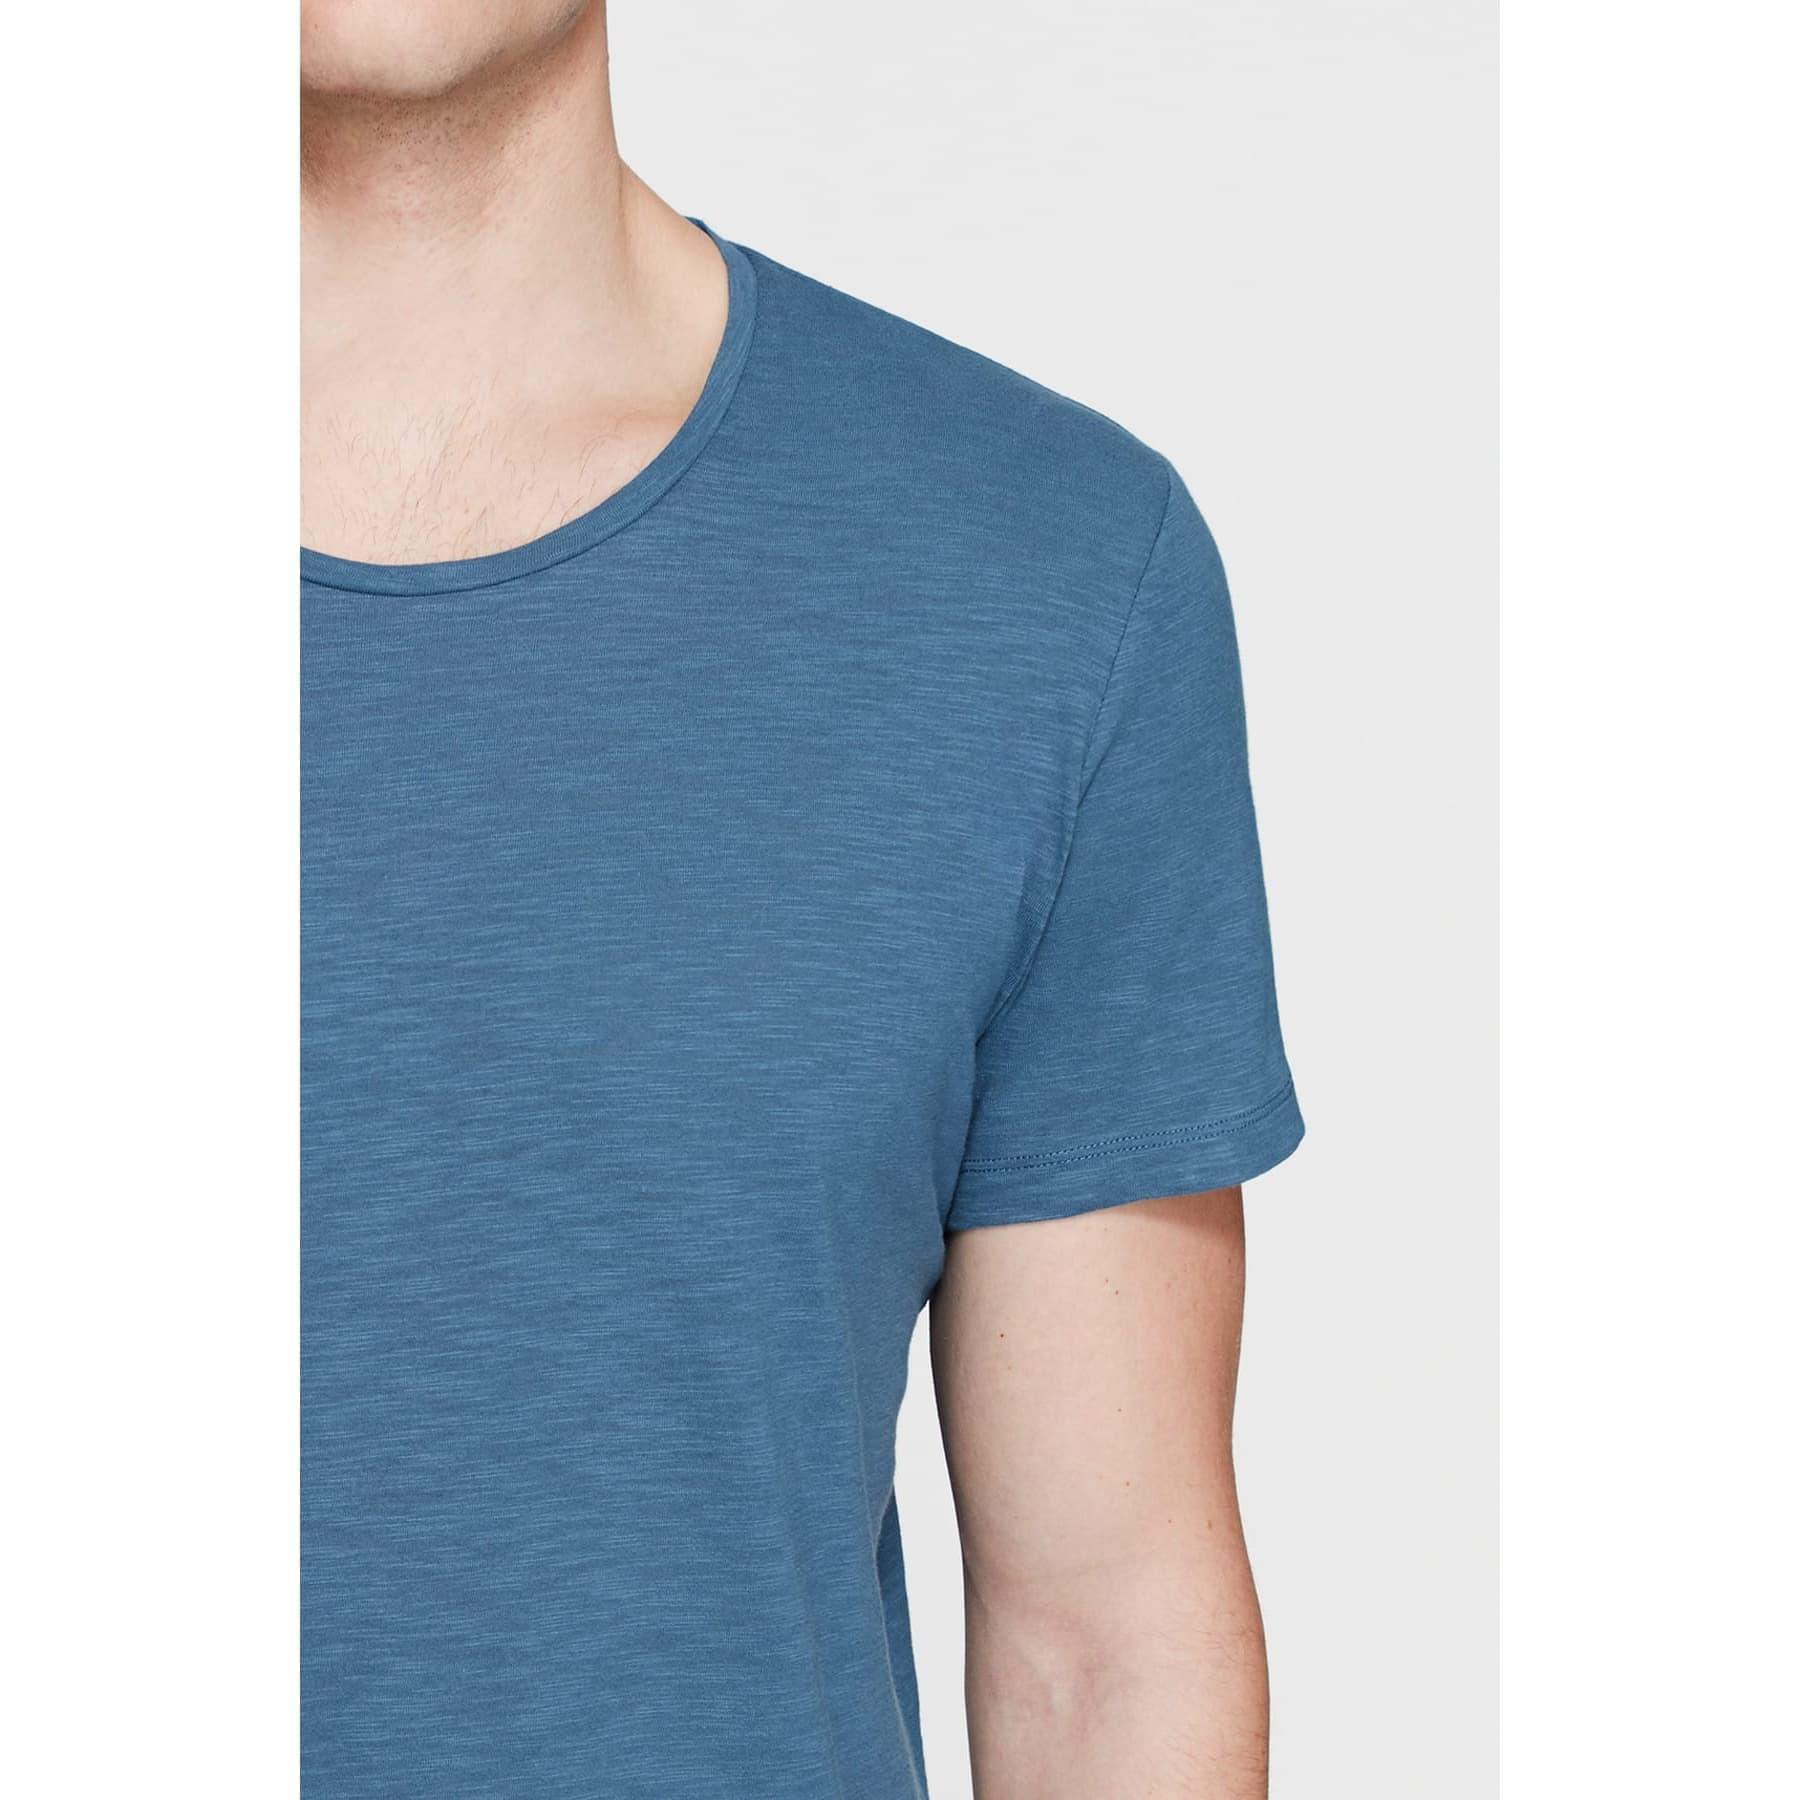 Tişört Uzay Mavi